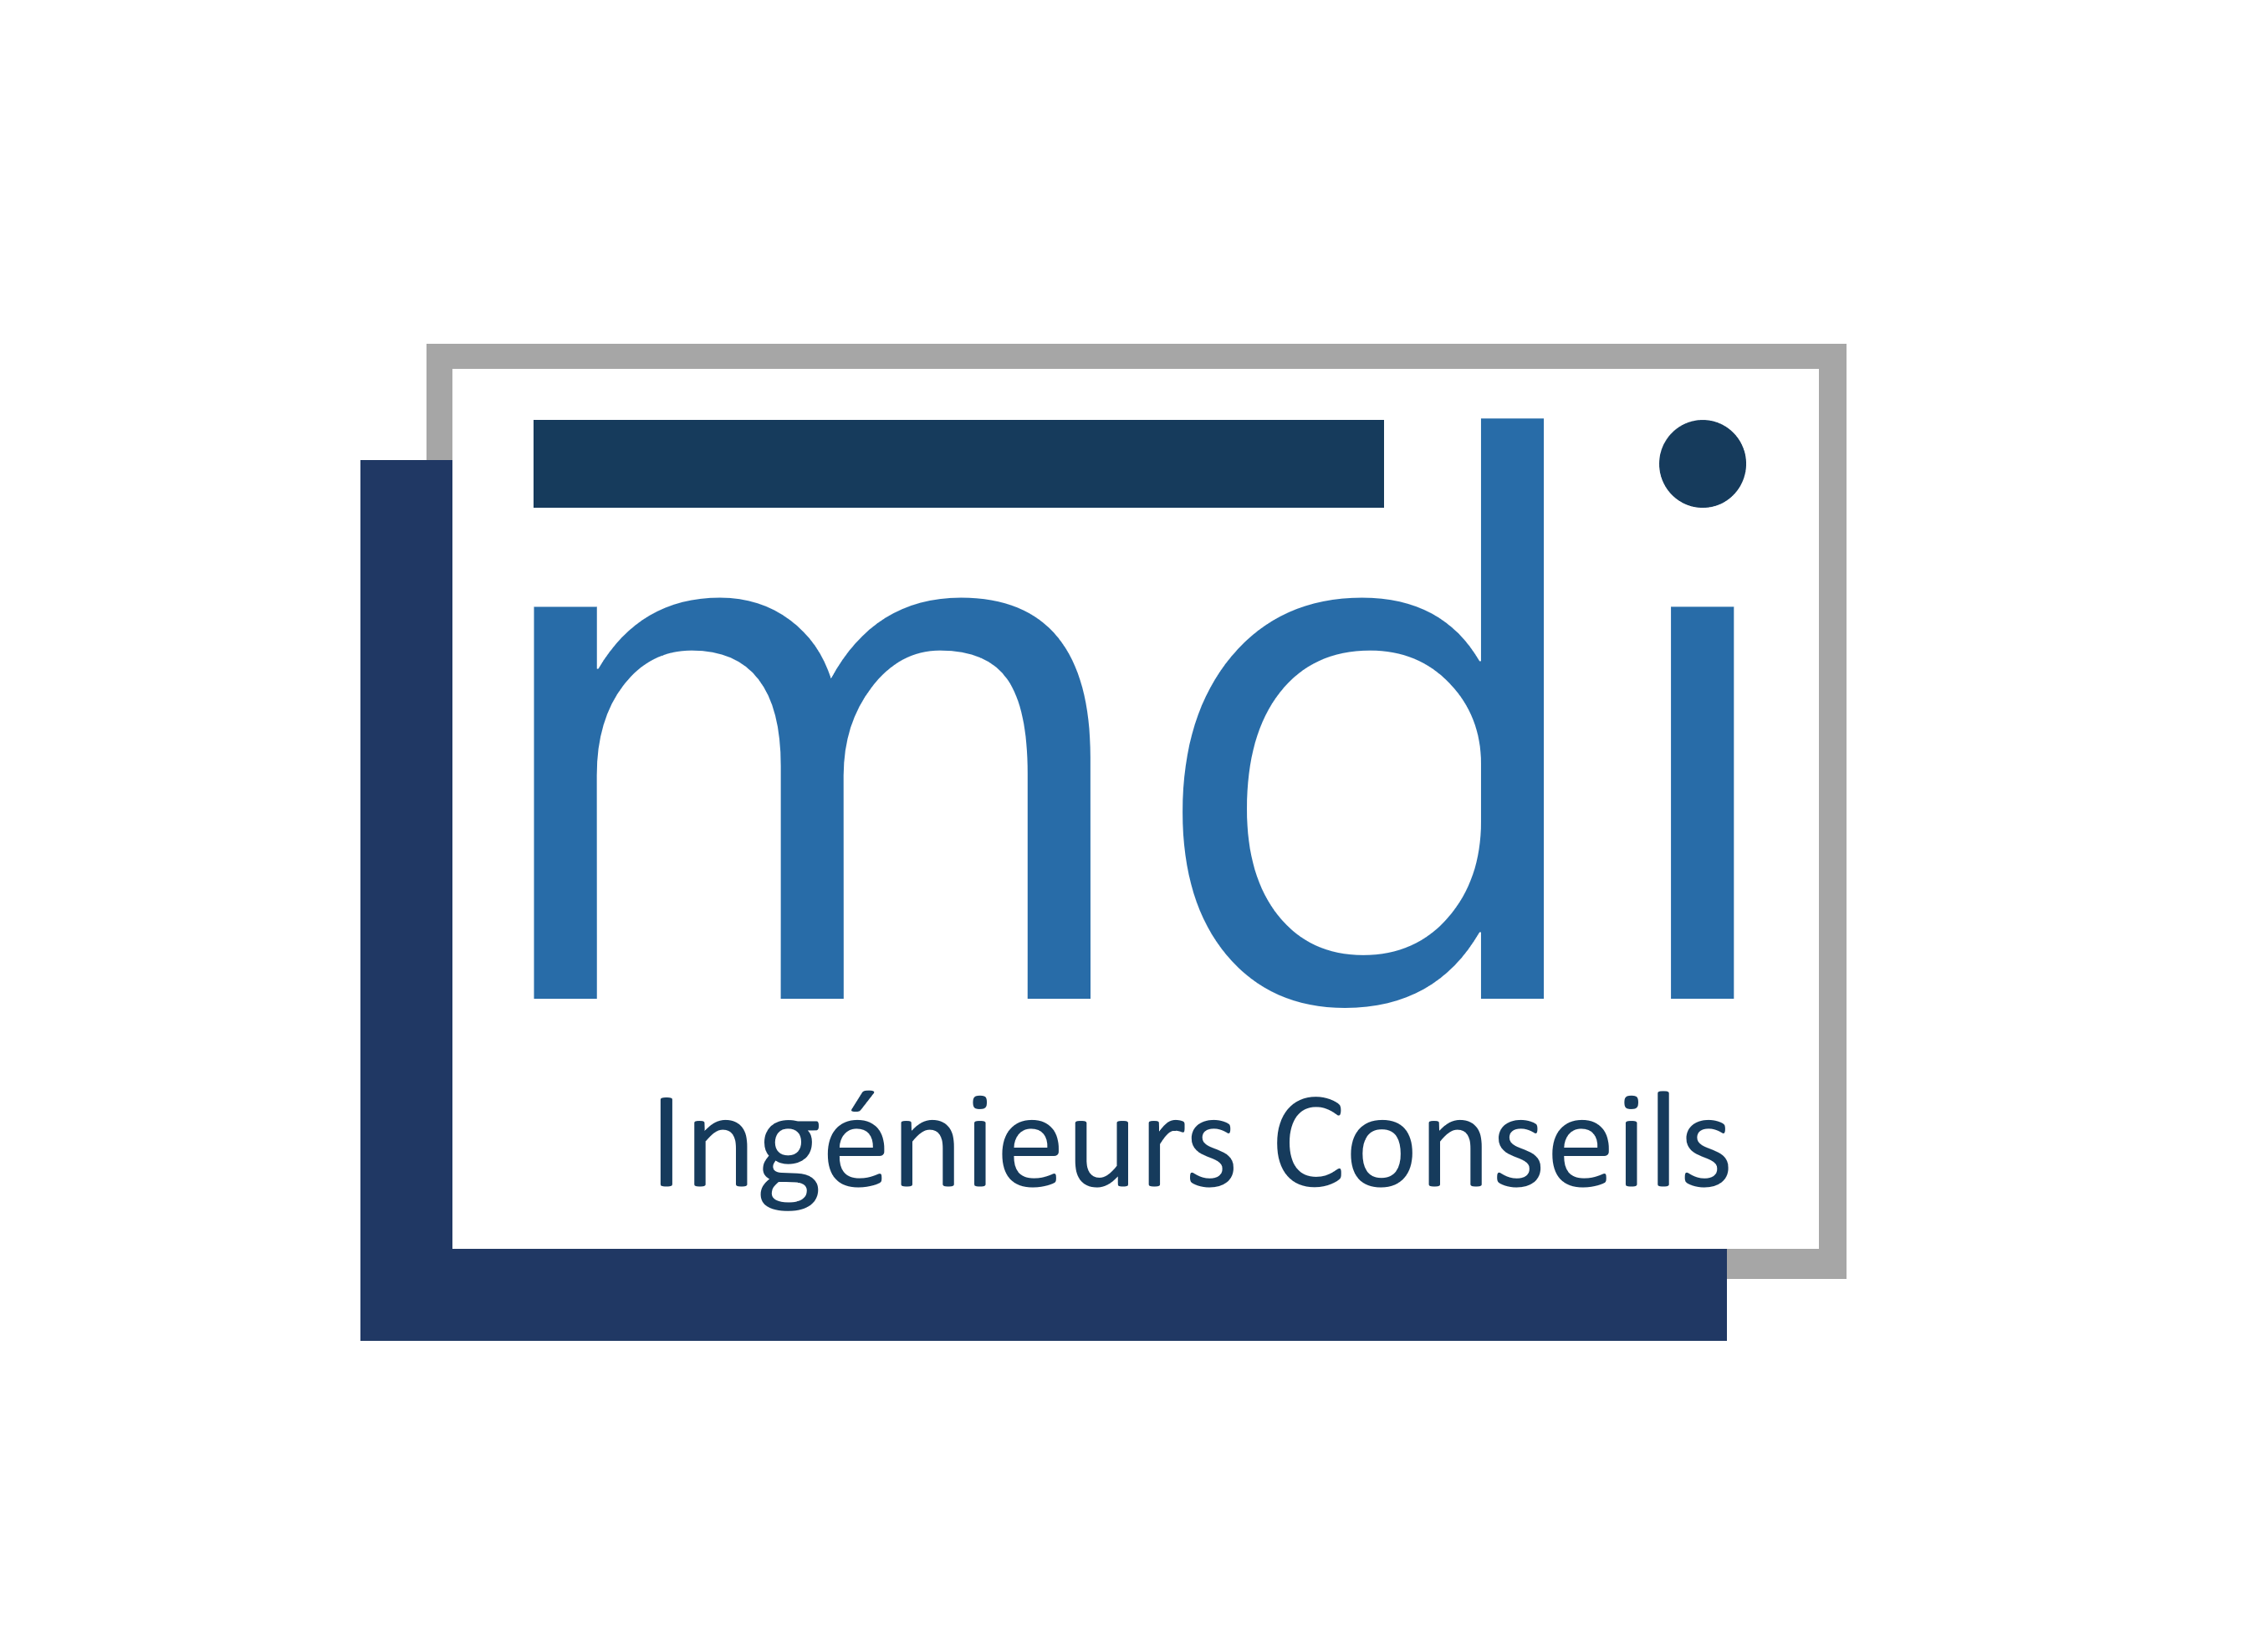 MDI - Ingénieurs Conseils Sàrl